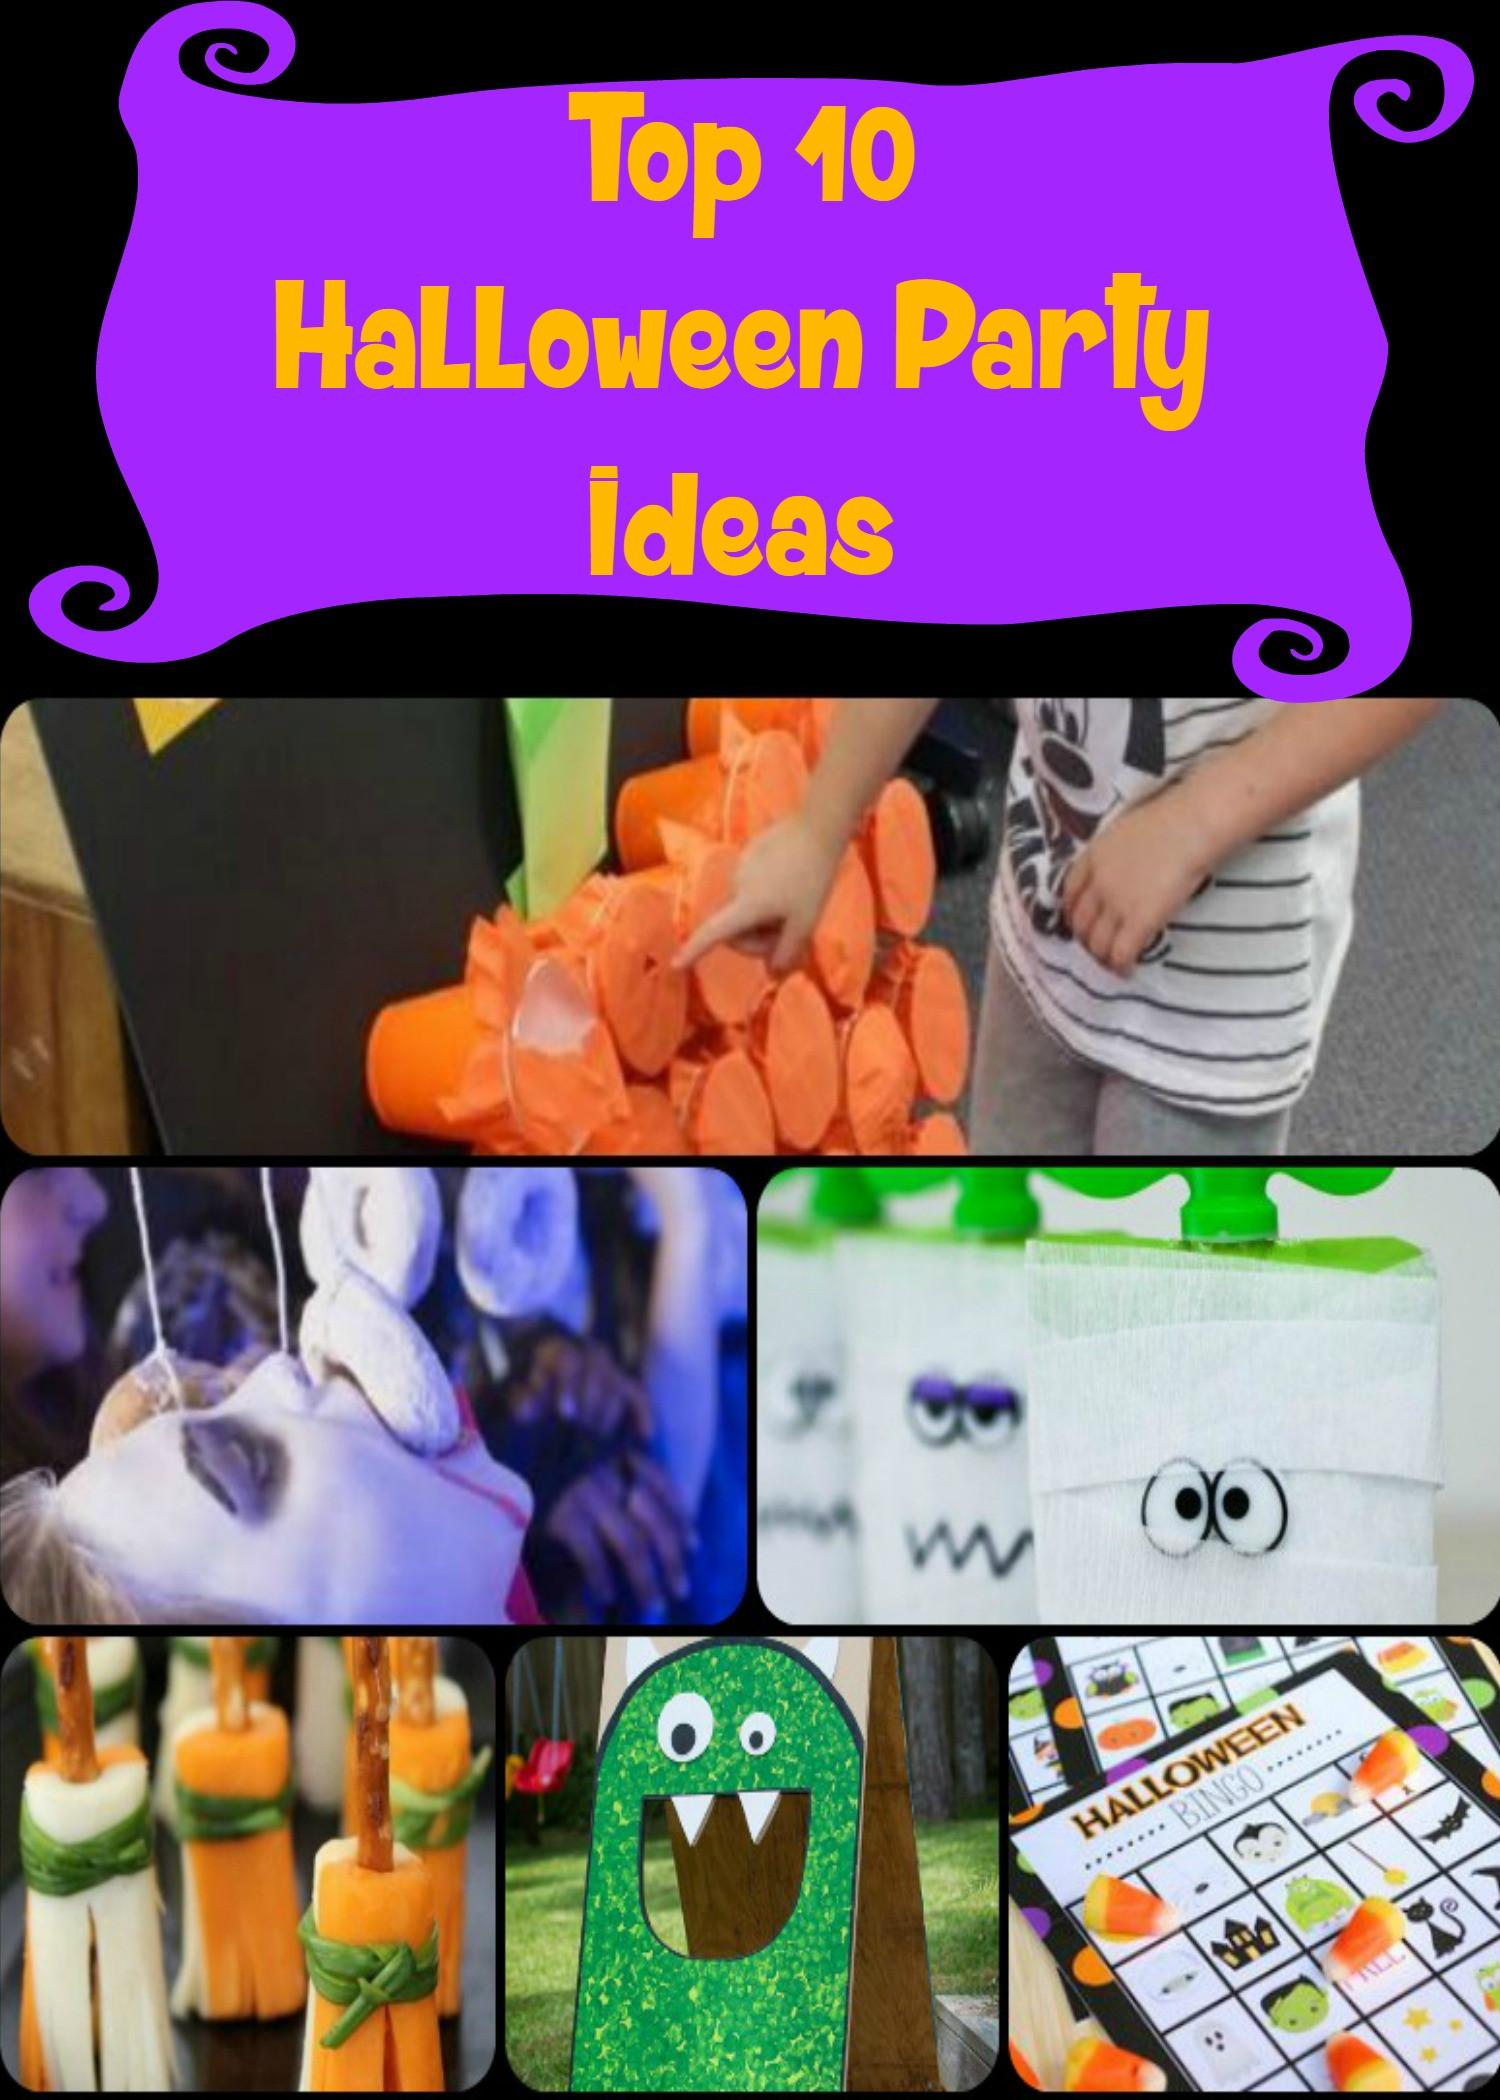 Great Halloween Party Ideas  Top 10 Kids Halloween Party ideas